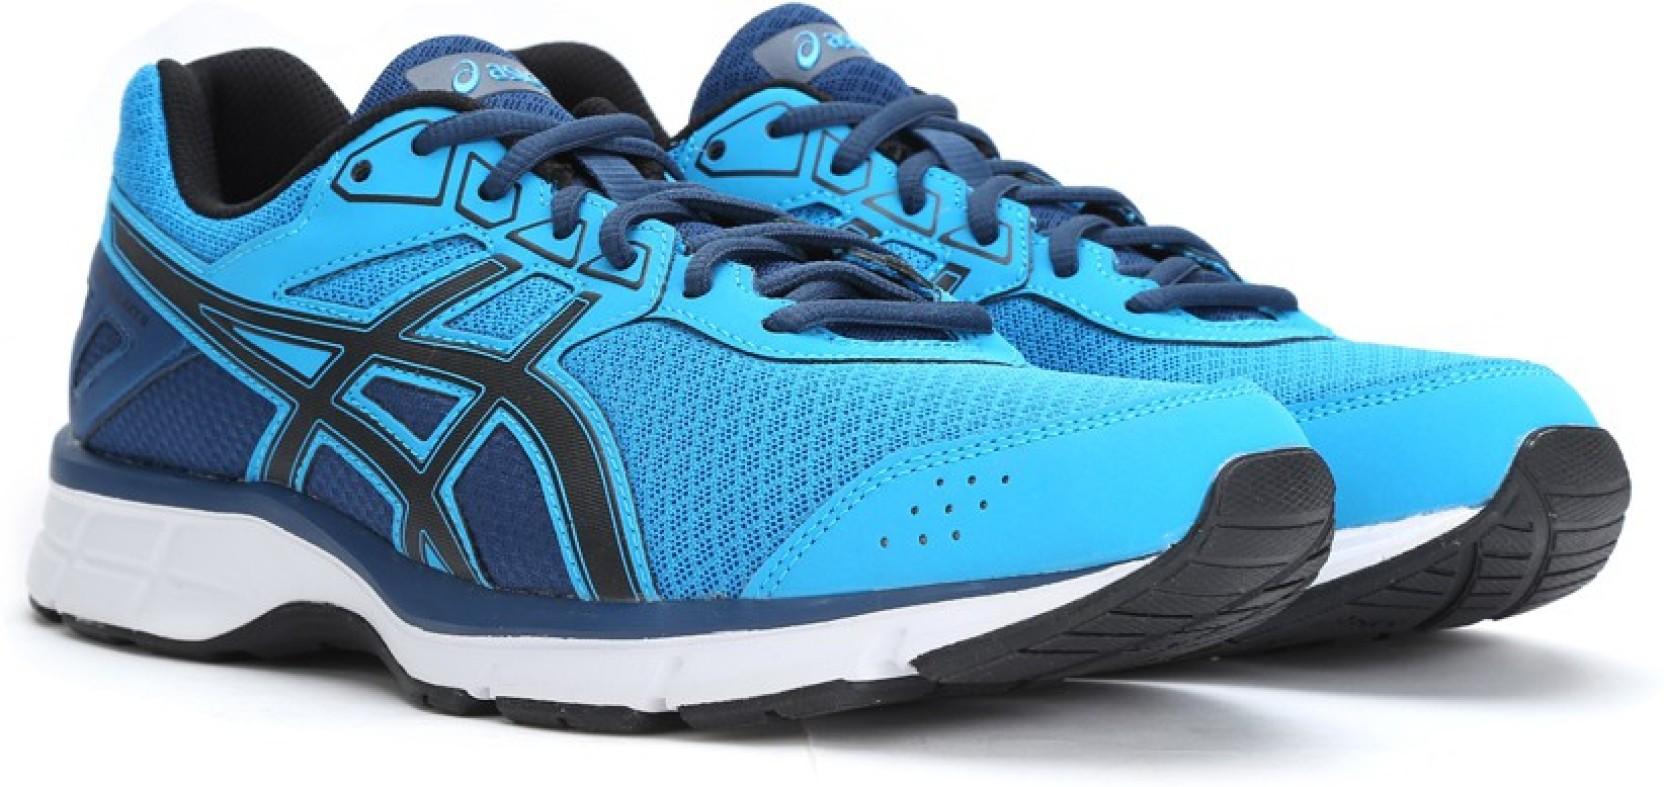 Asics GEL GALAXY 9 Running Shoes For Men